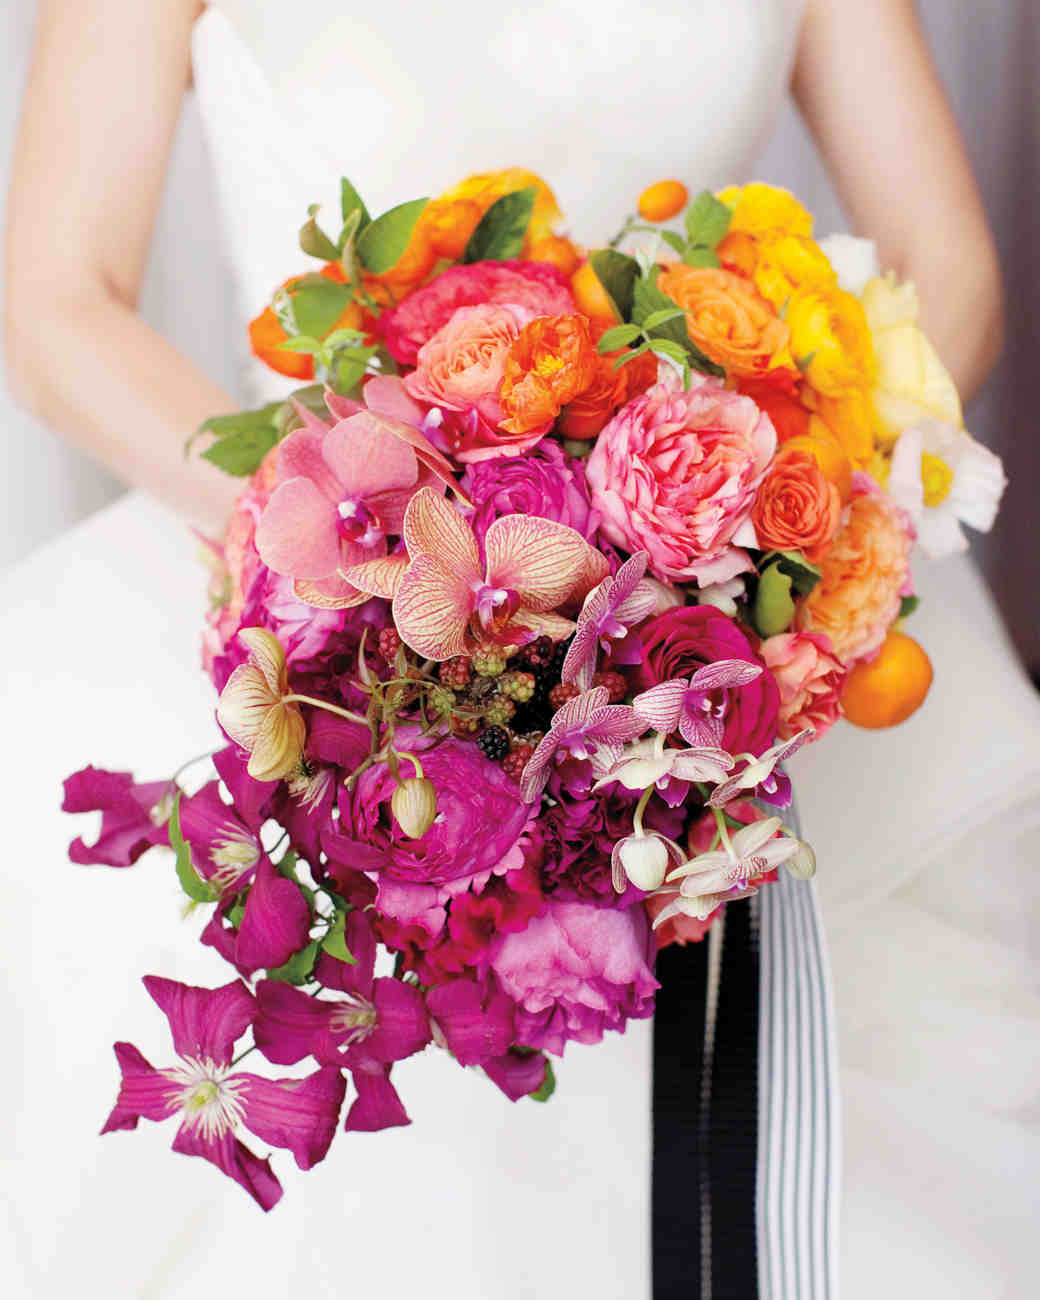 hanna-bret-bridal-bouquet-0049-s111676.jpg